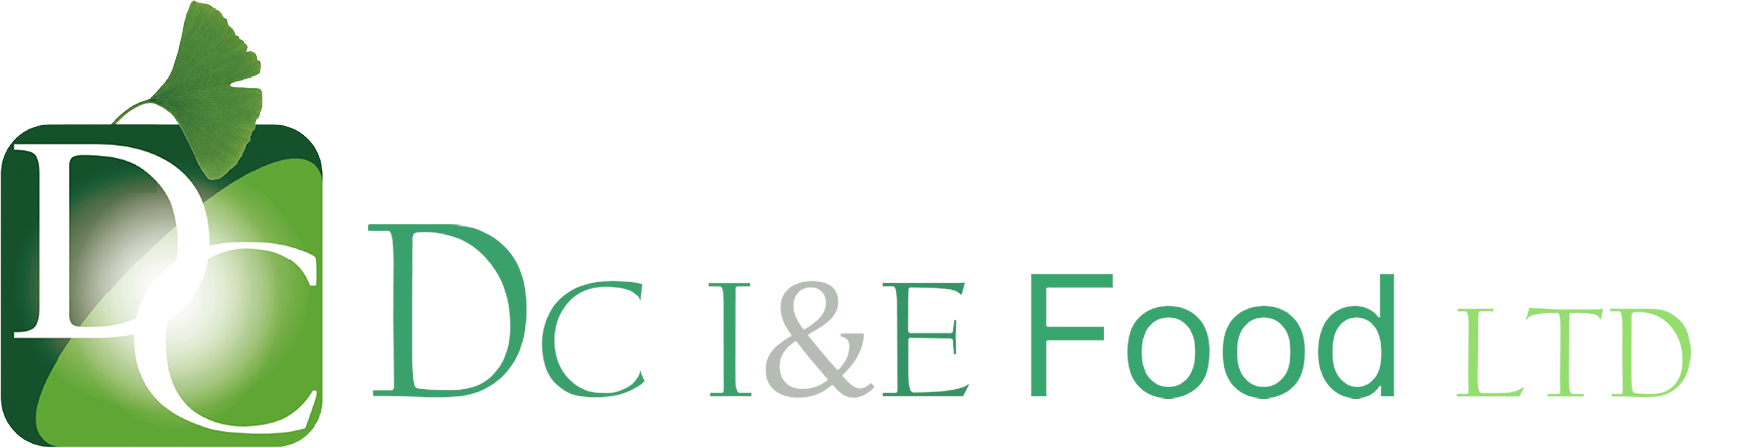 DC I&E Foods Ltd